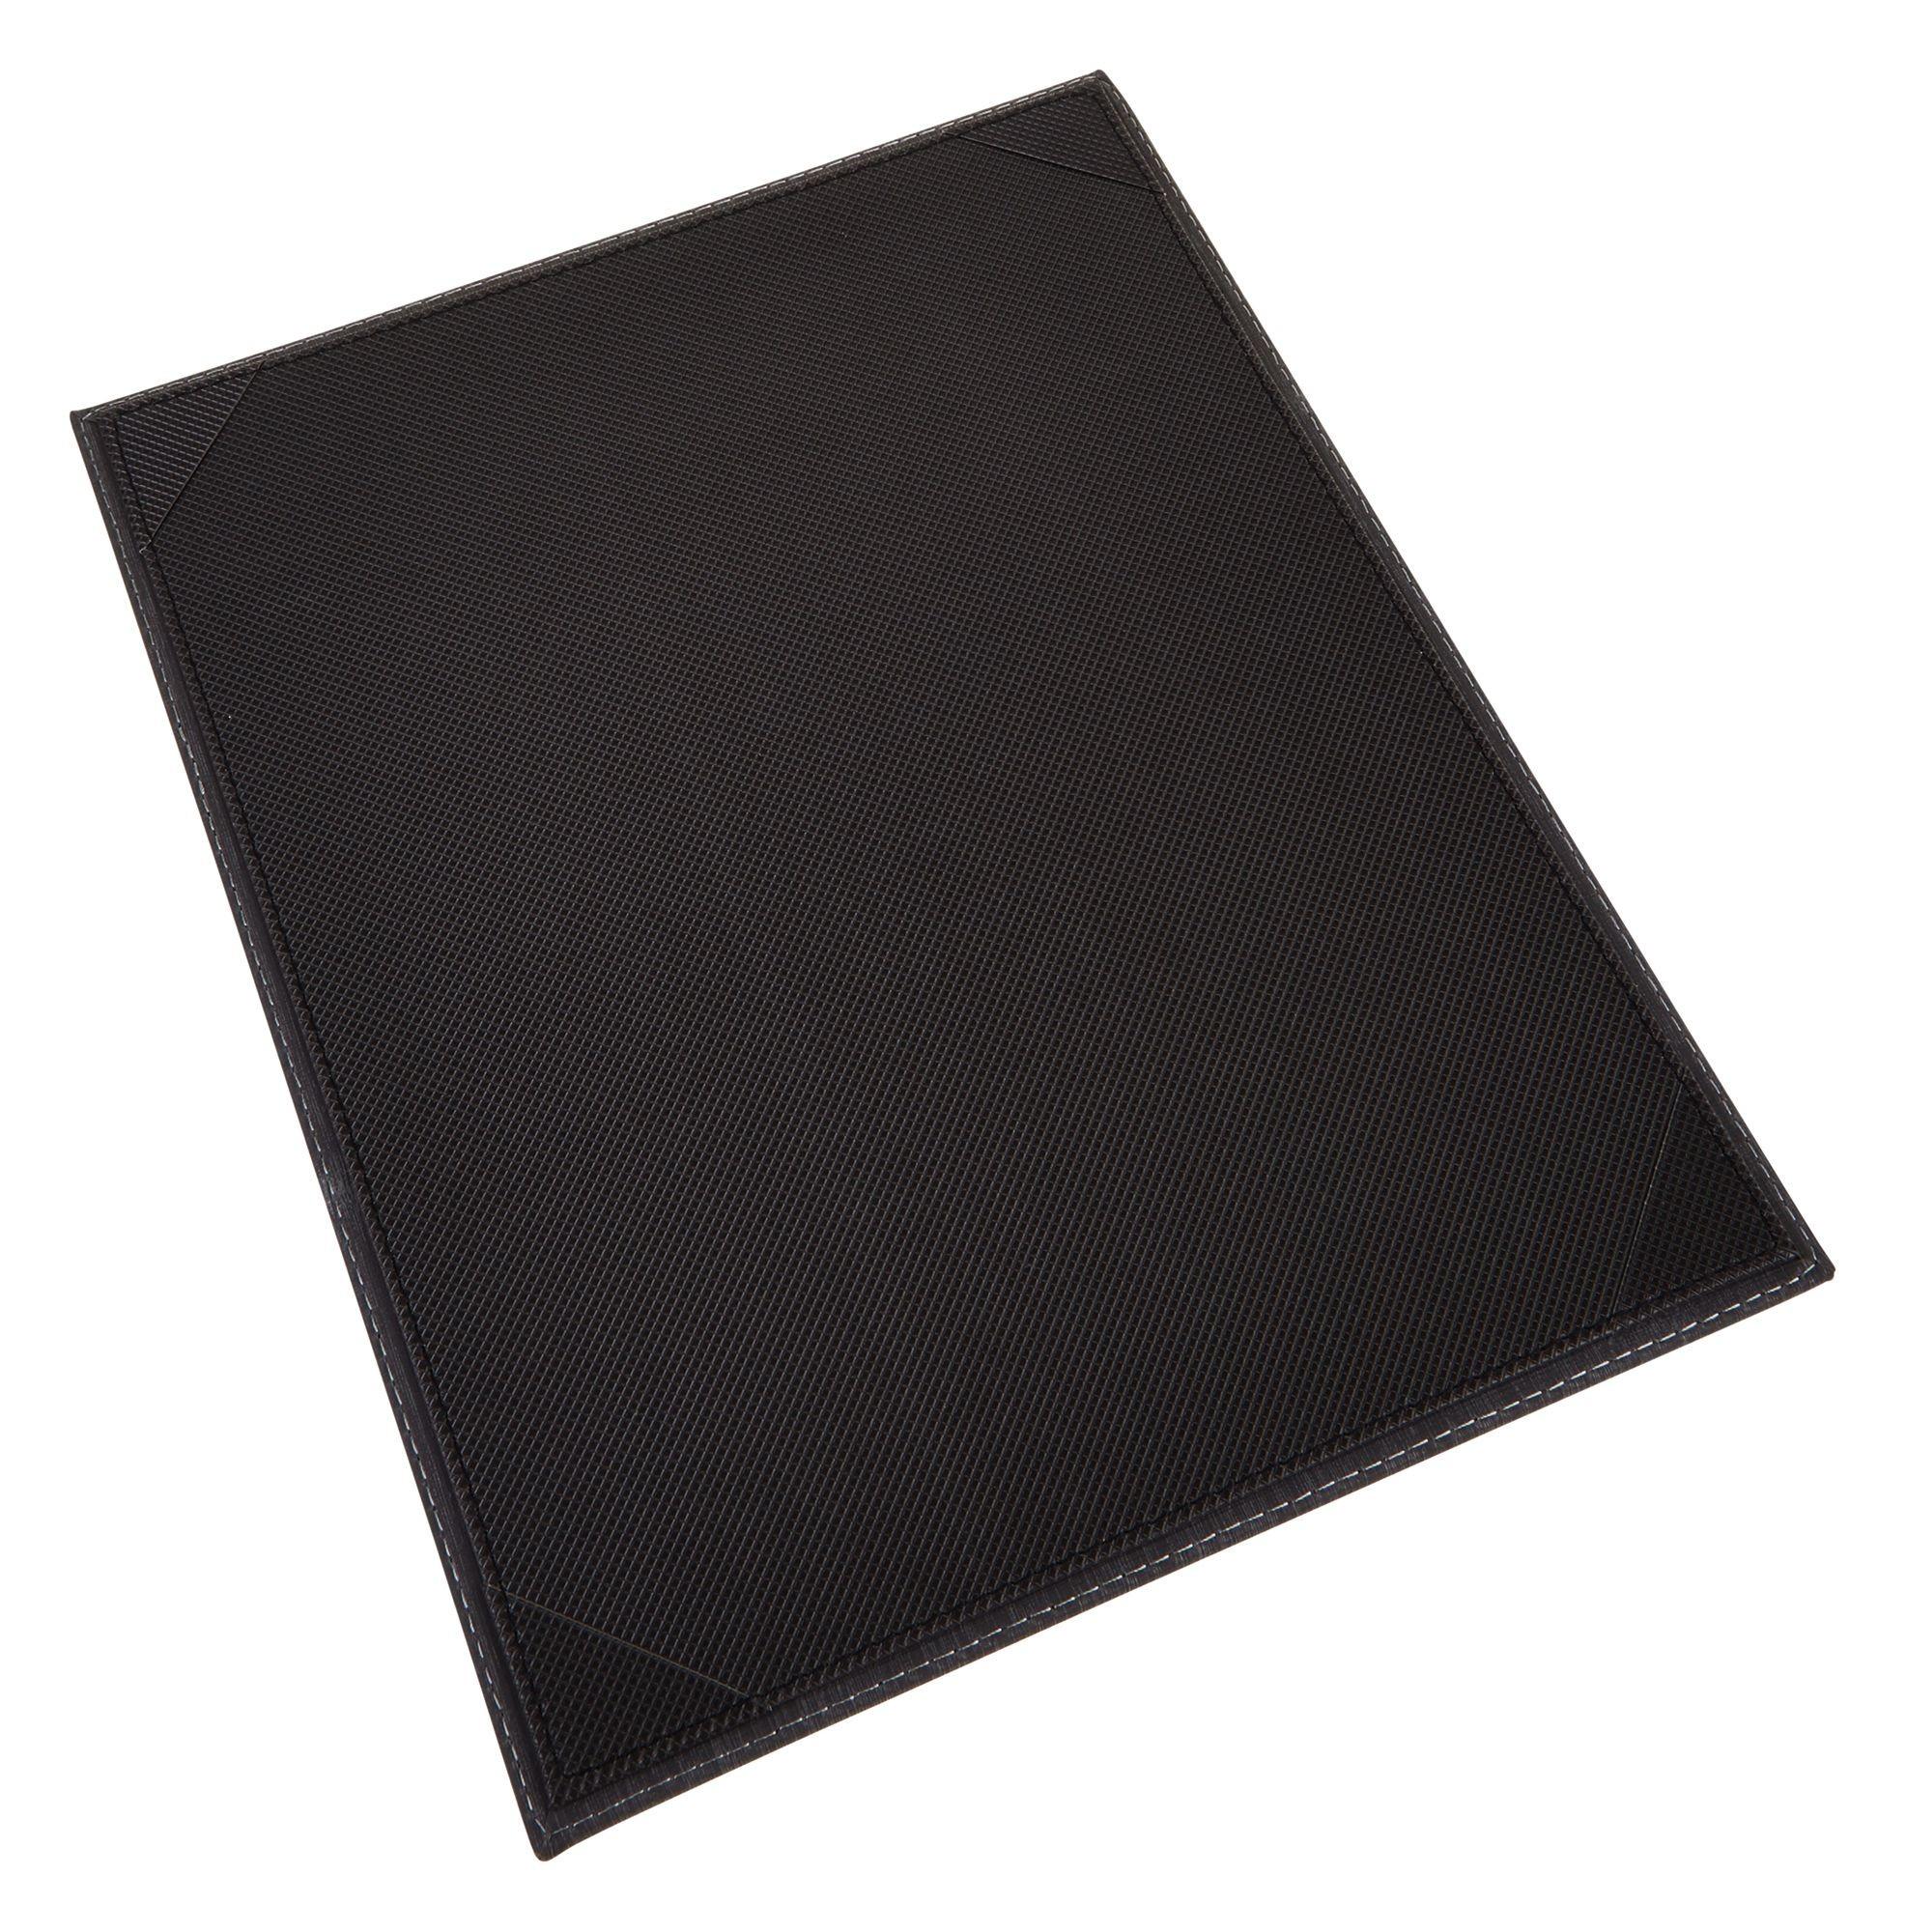 "Winco LMS-814BK 8-1/2"" x 14"" Black Leatherette Single Panel Menu Cover"